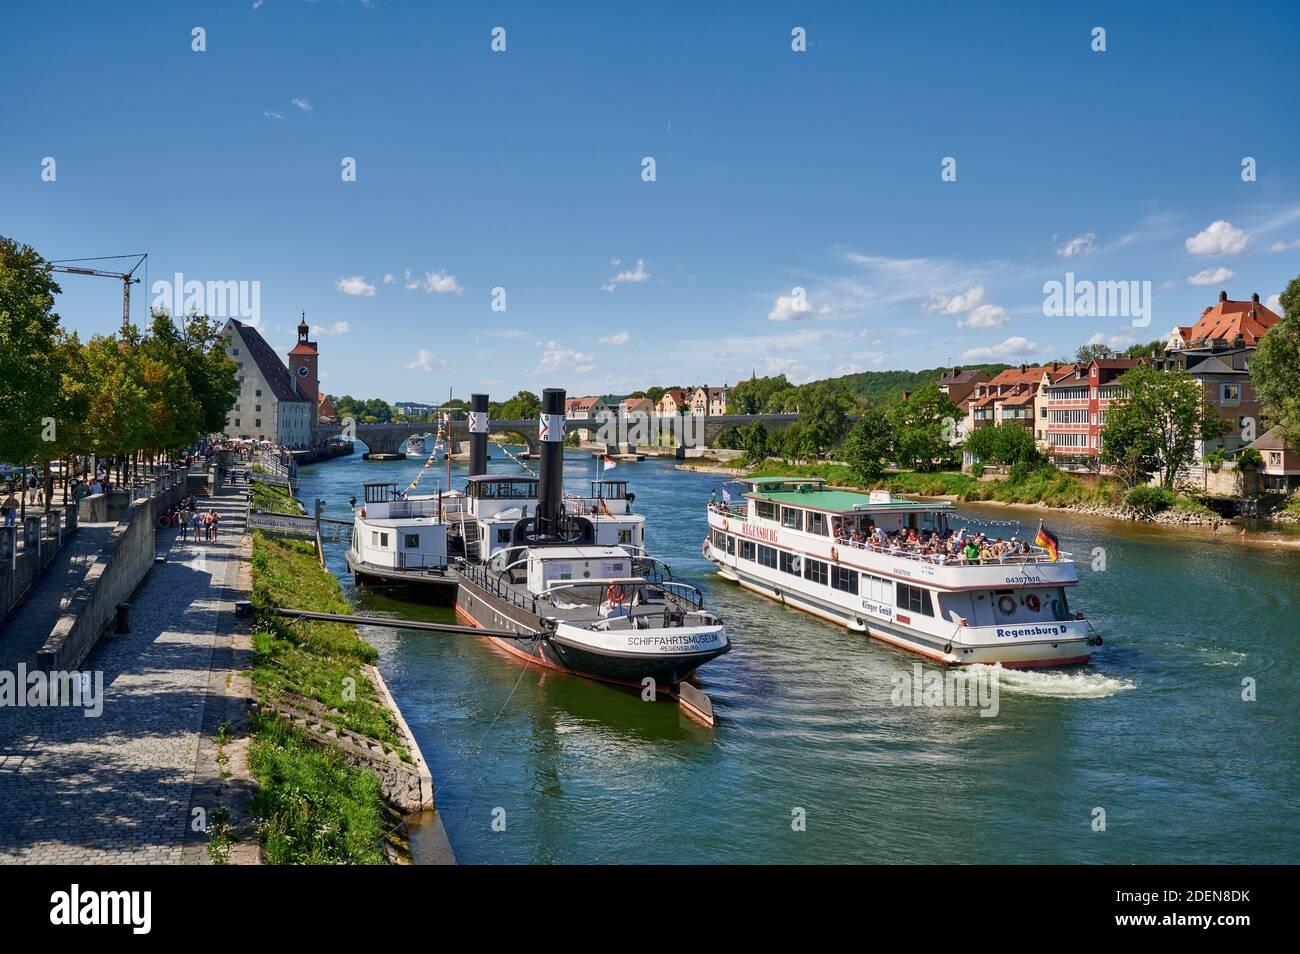 Museumsschiff RUTHOF / ÉRSEKCSANÁD Ship Museum and cruise ship on River Danube, Regensburg , Bavaria, Germany Stock Photo